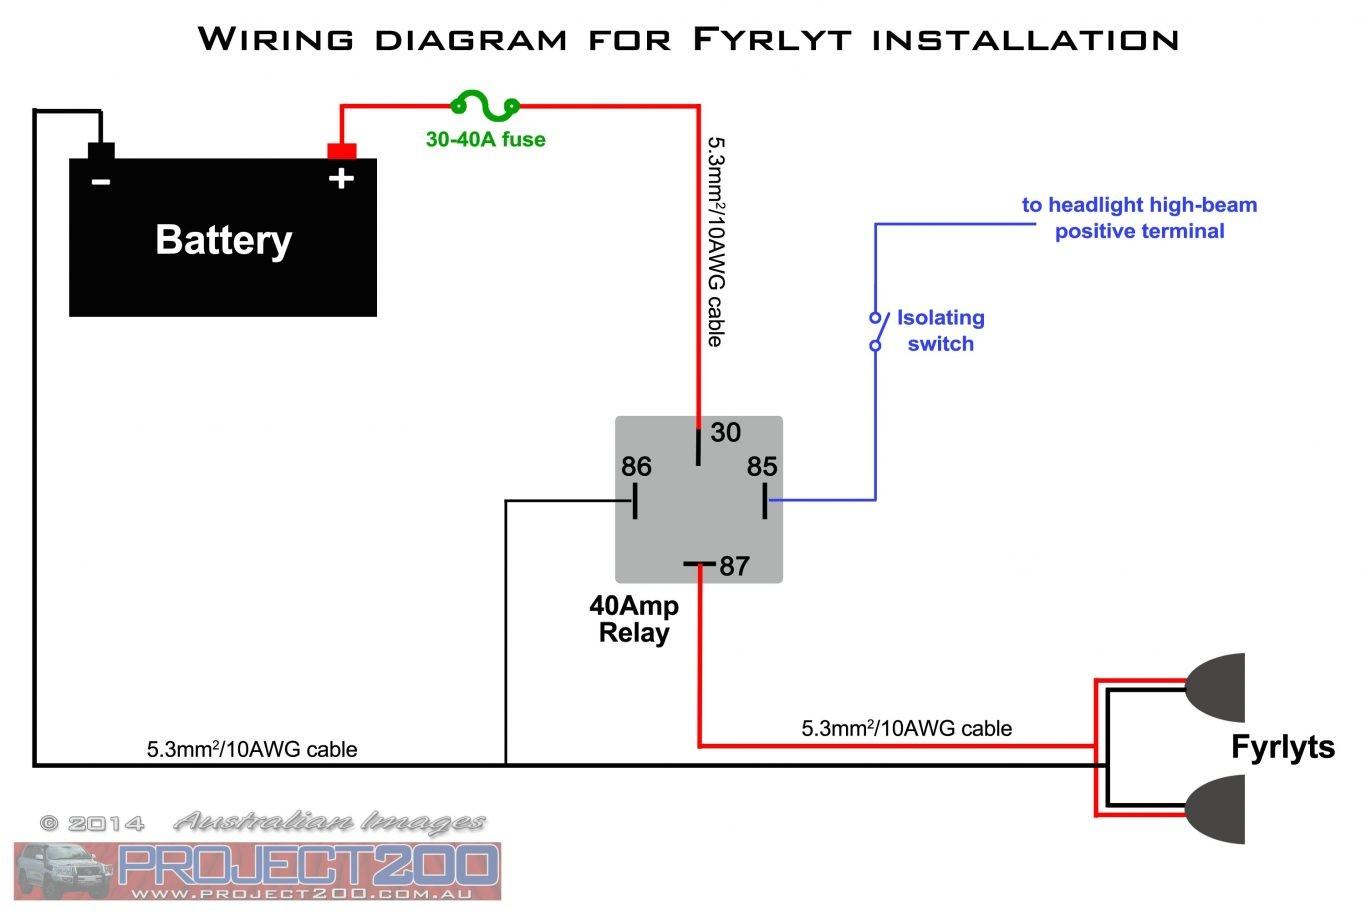 Wiring Diagram For 12v Led Lights Spotlights Harness Strip In Series Spotlight Landscape Lighting Lamp Kit